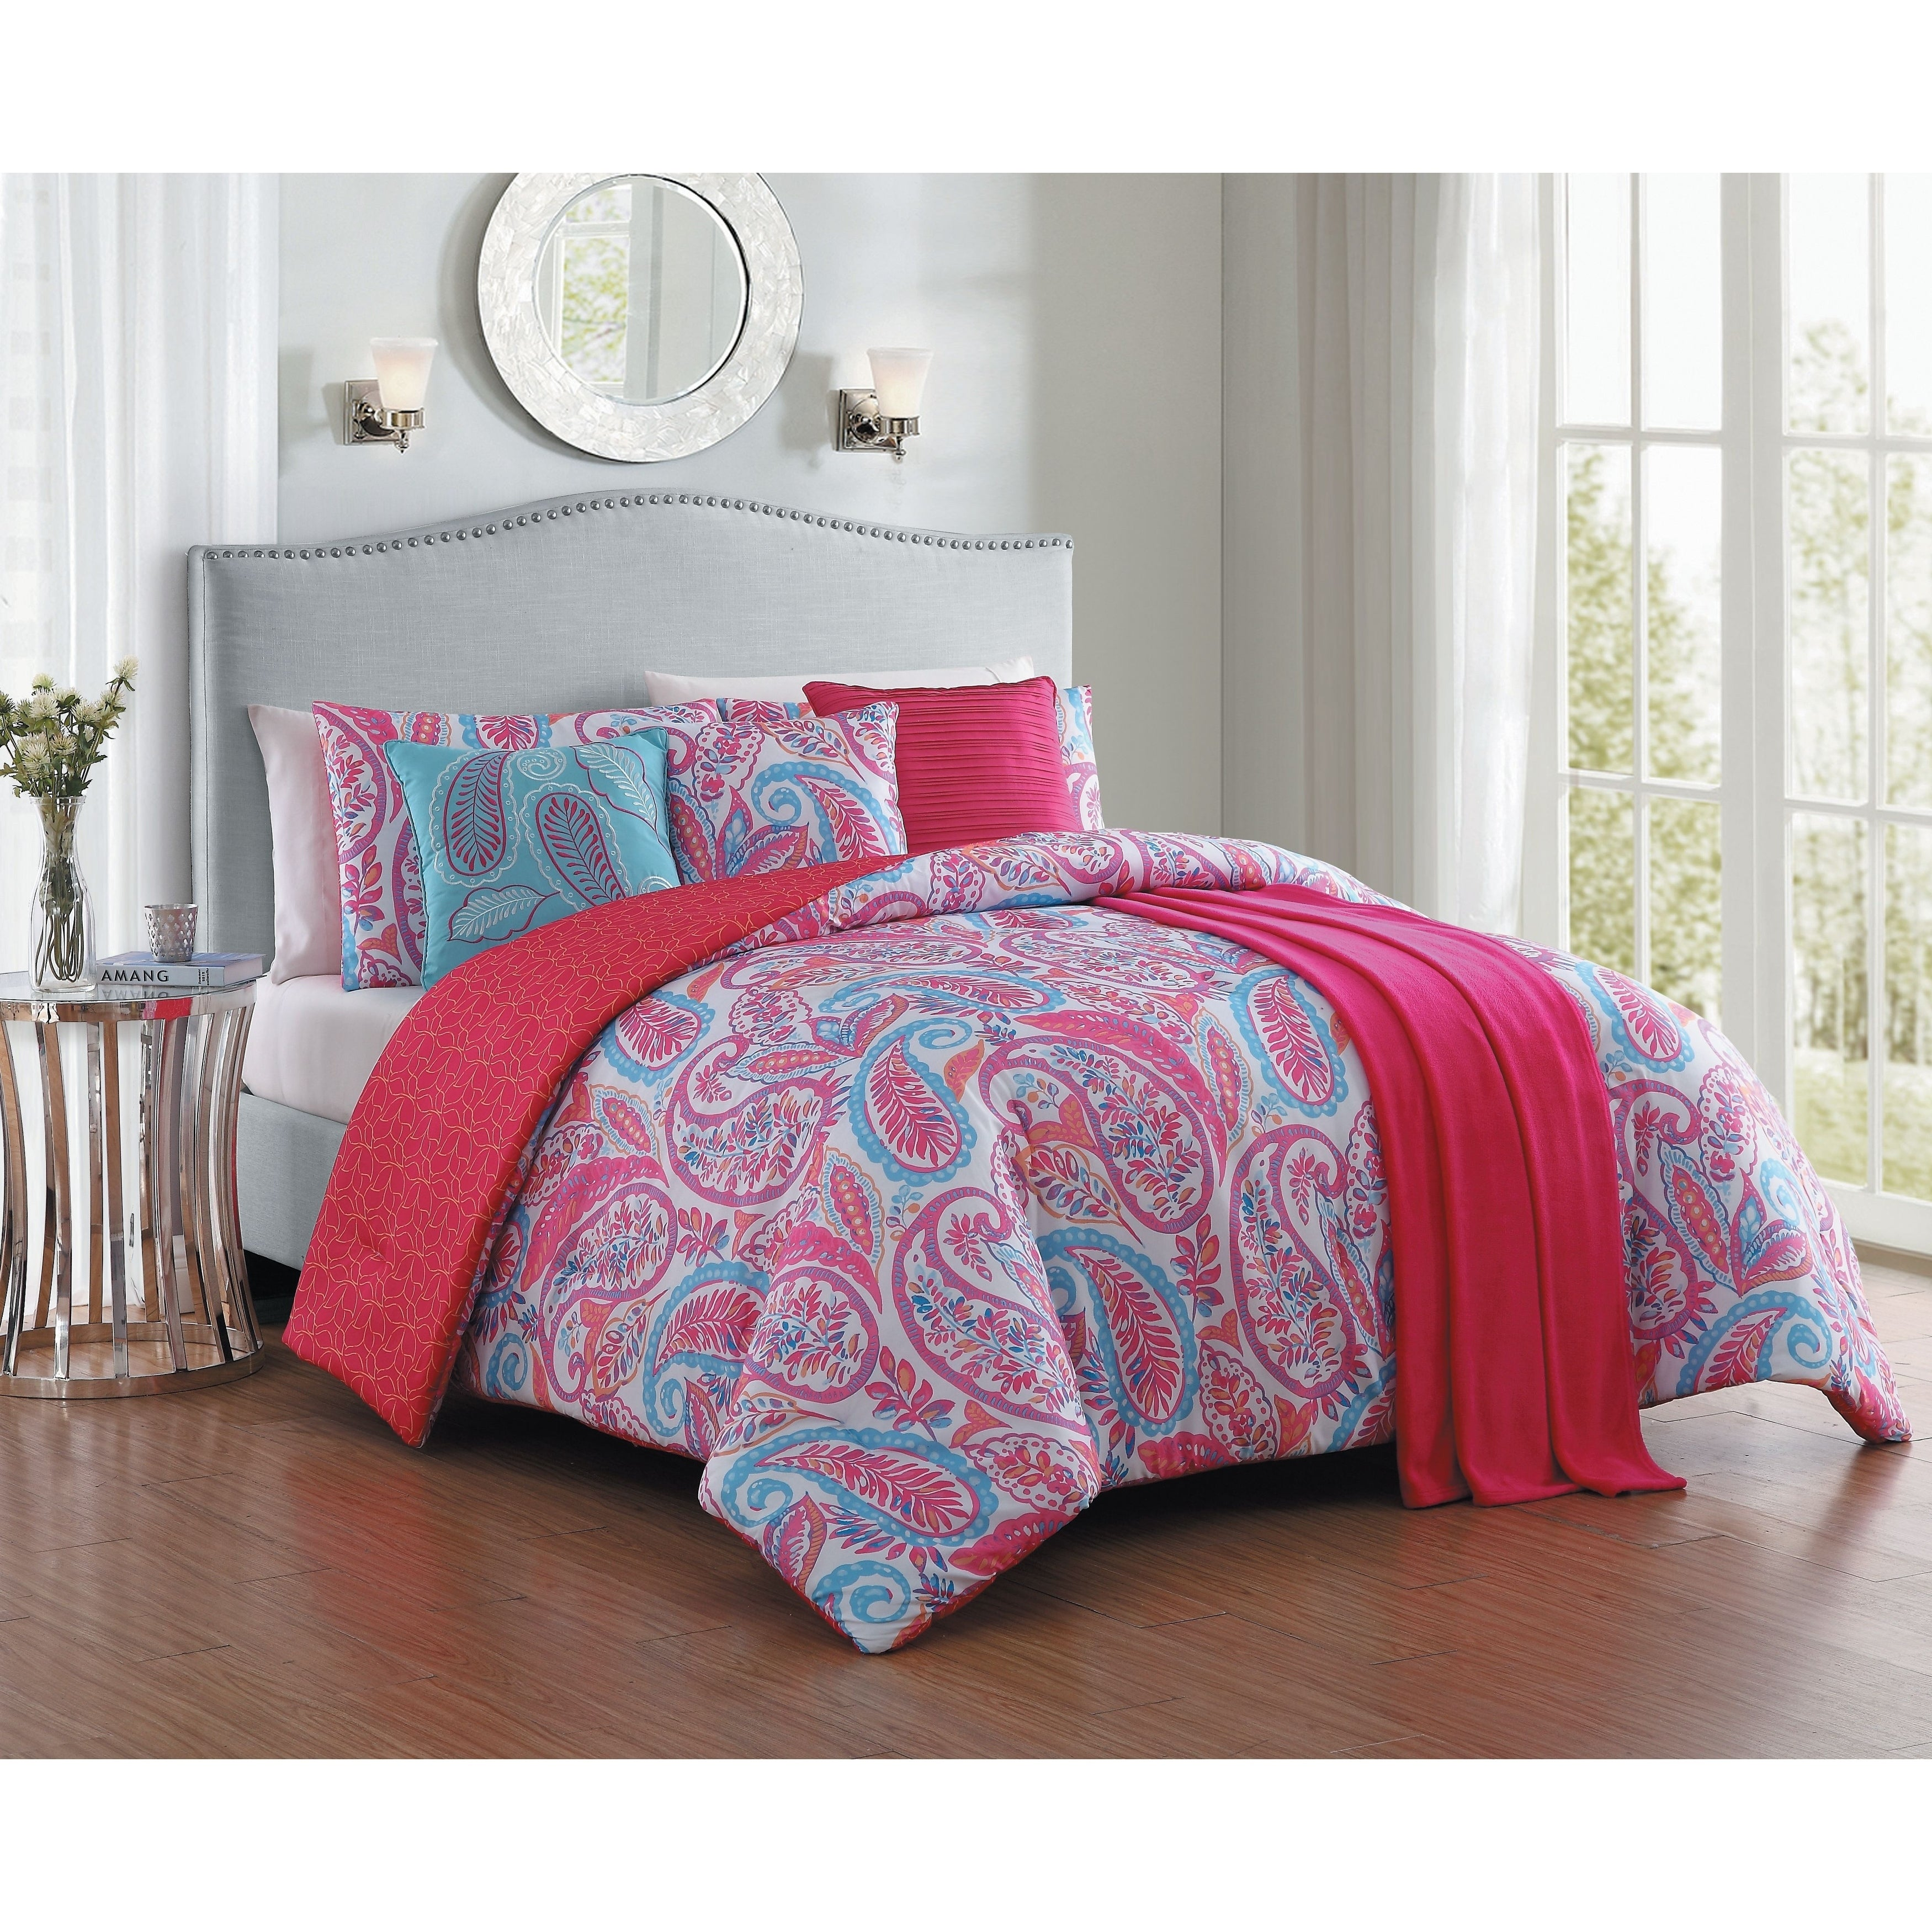 Avondale Manor Seville 3 Piece Quilt Set King Pink